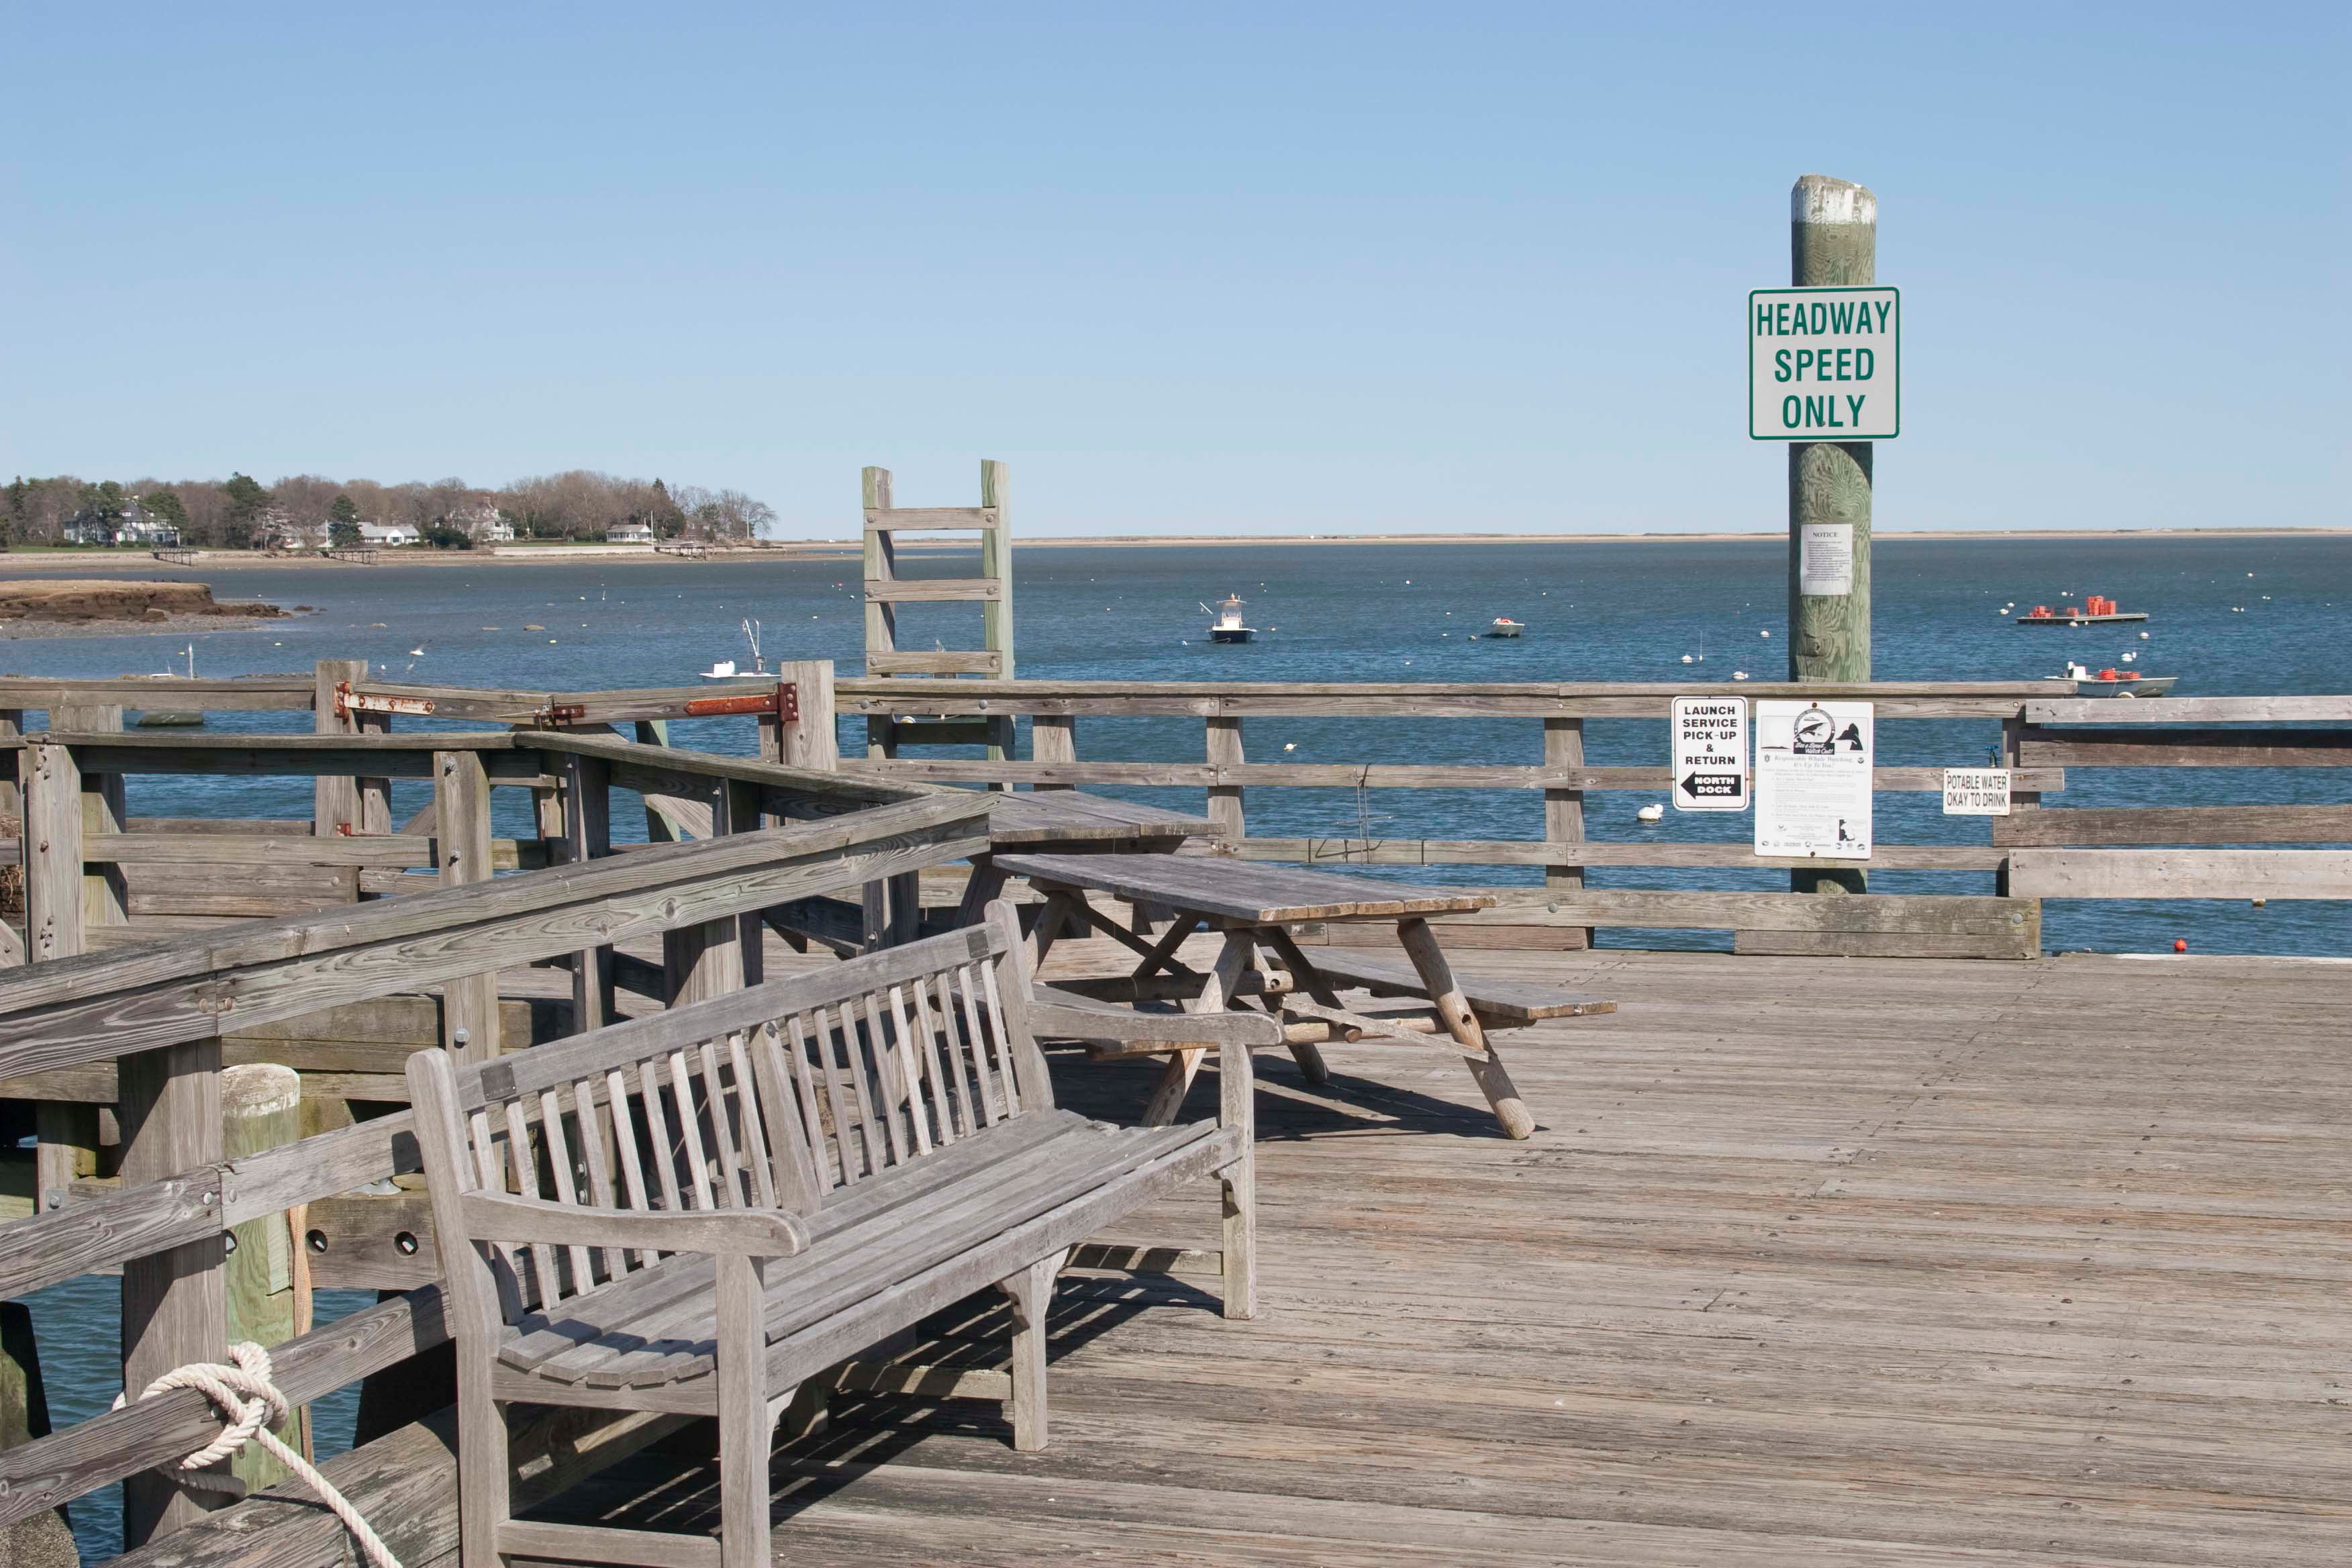 The pier at Snug Harbor in Duxbury, home of Duxbury Bookkeeping.